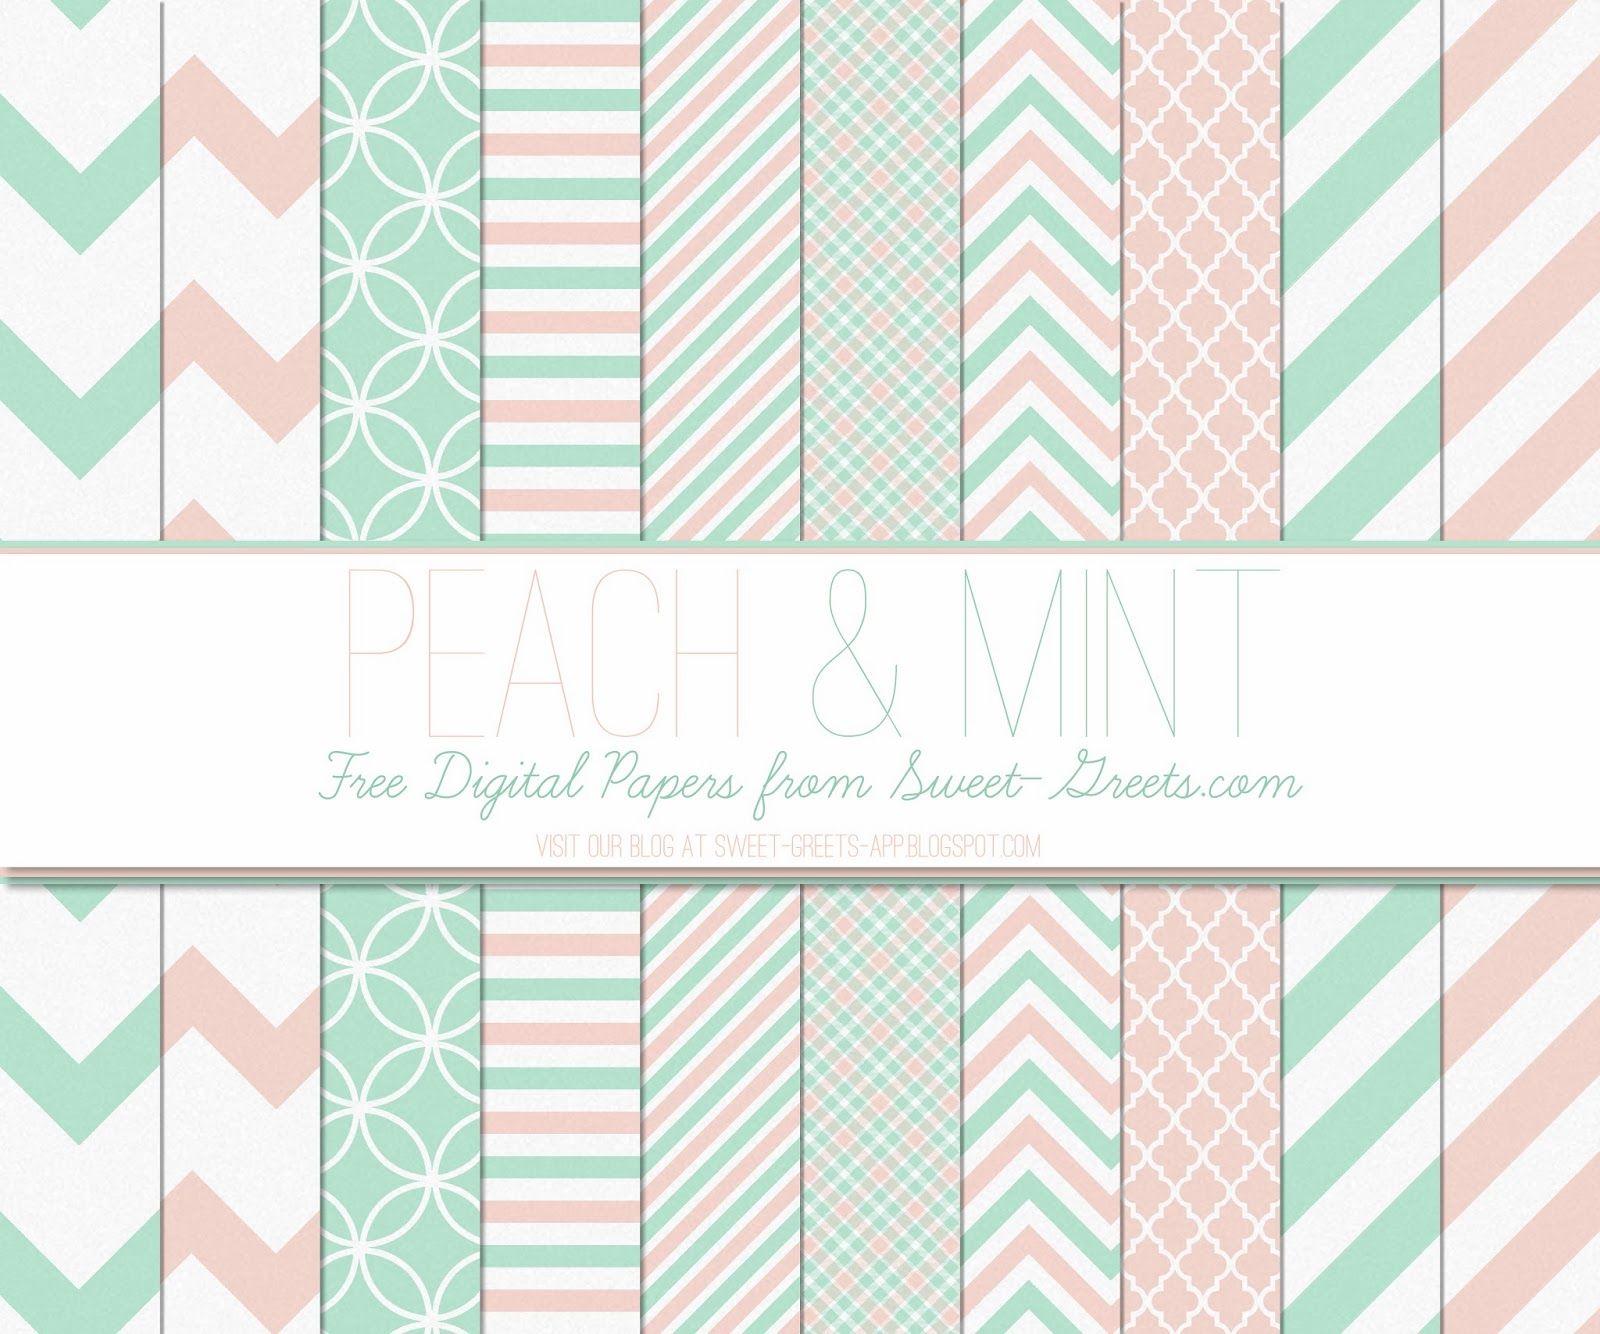 Free Peach and Mint Digital Paper Set Digital paper